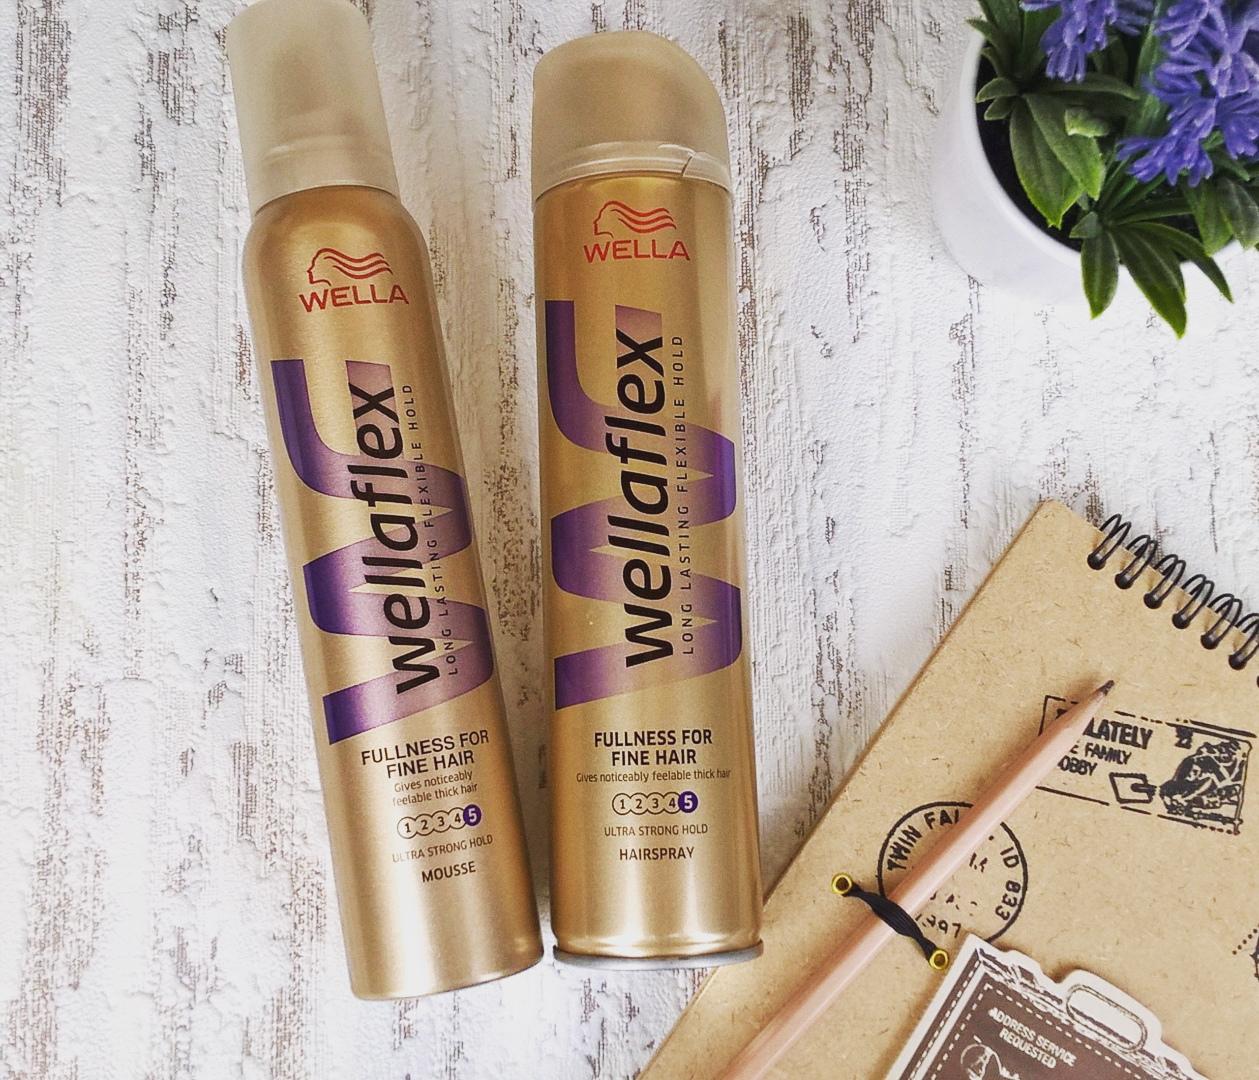 Lakier I Pianka Wella Wellaflex Fullness For Fine Hair